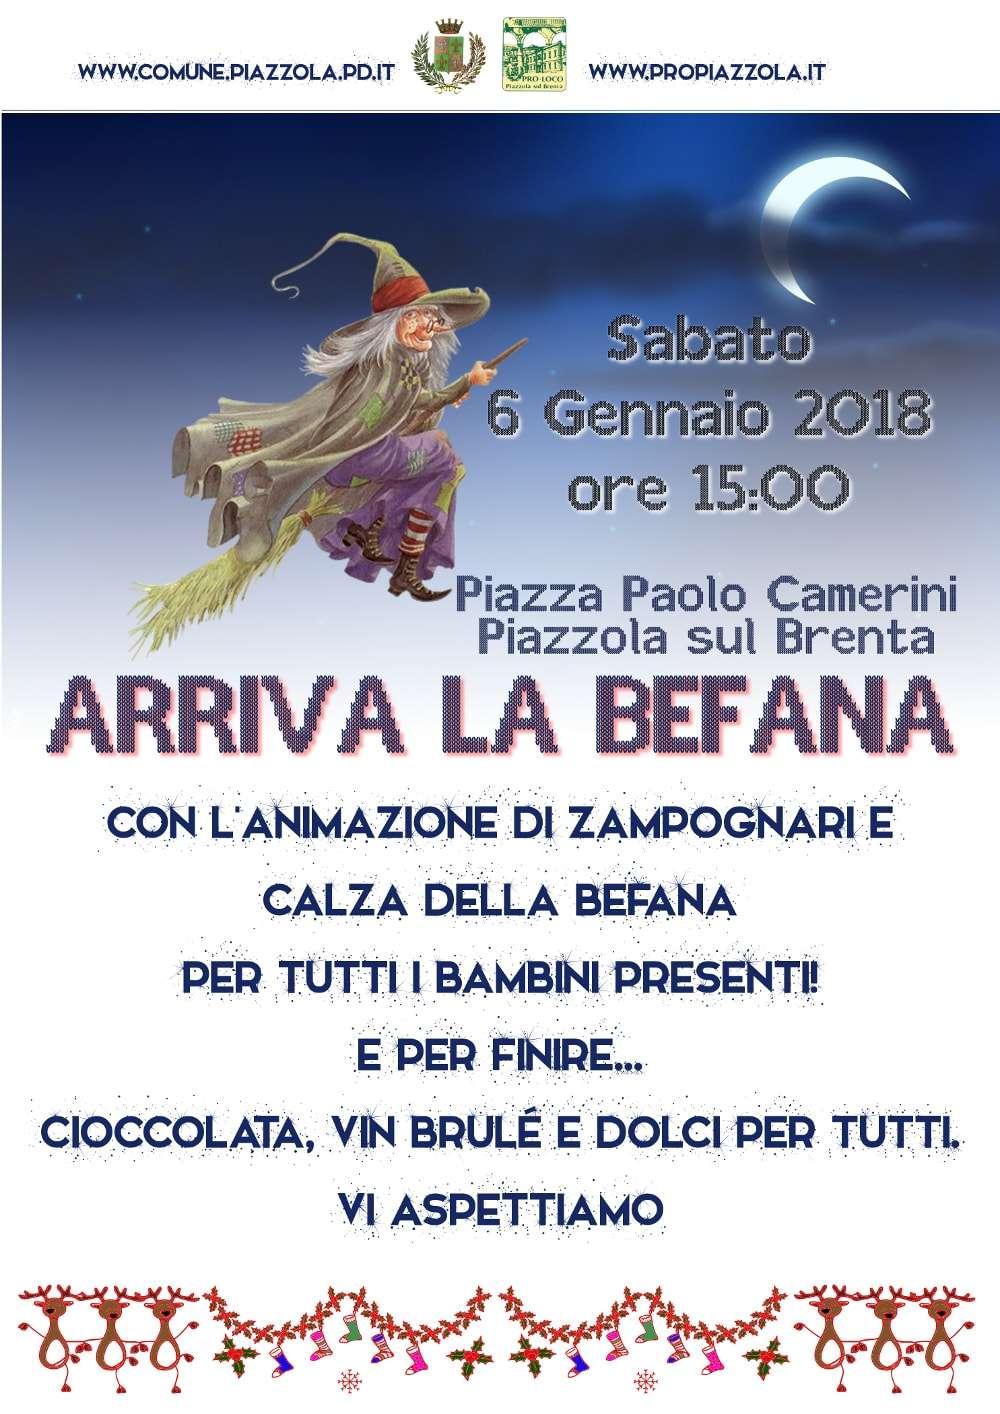 Festa della befana propiazzola for Fiera piazzola sul brenta 2017